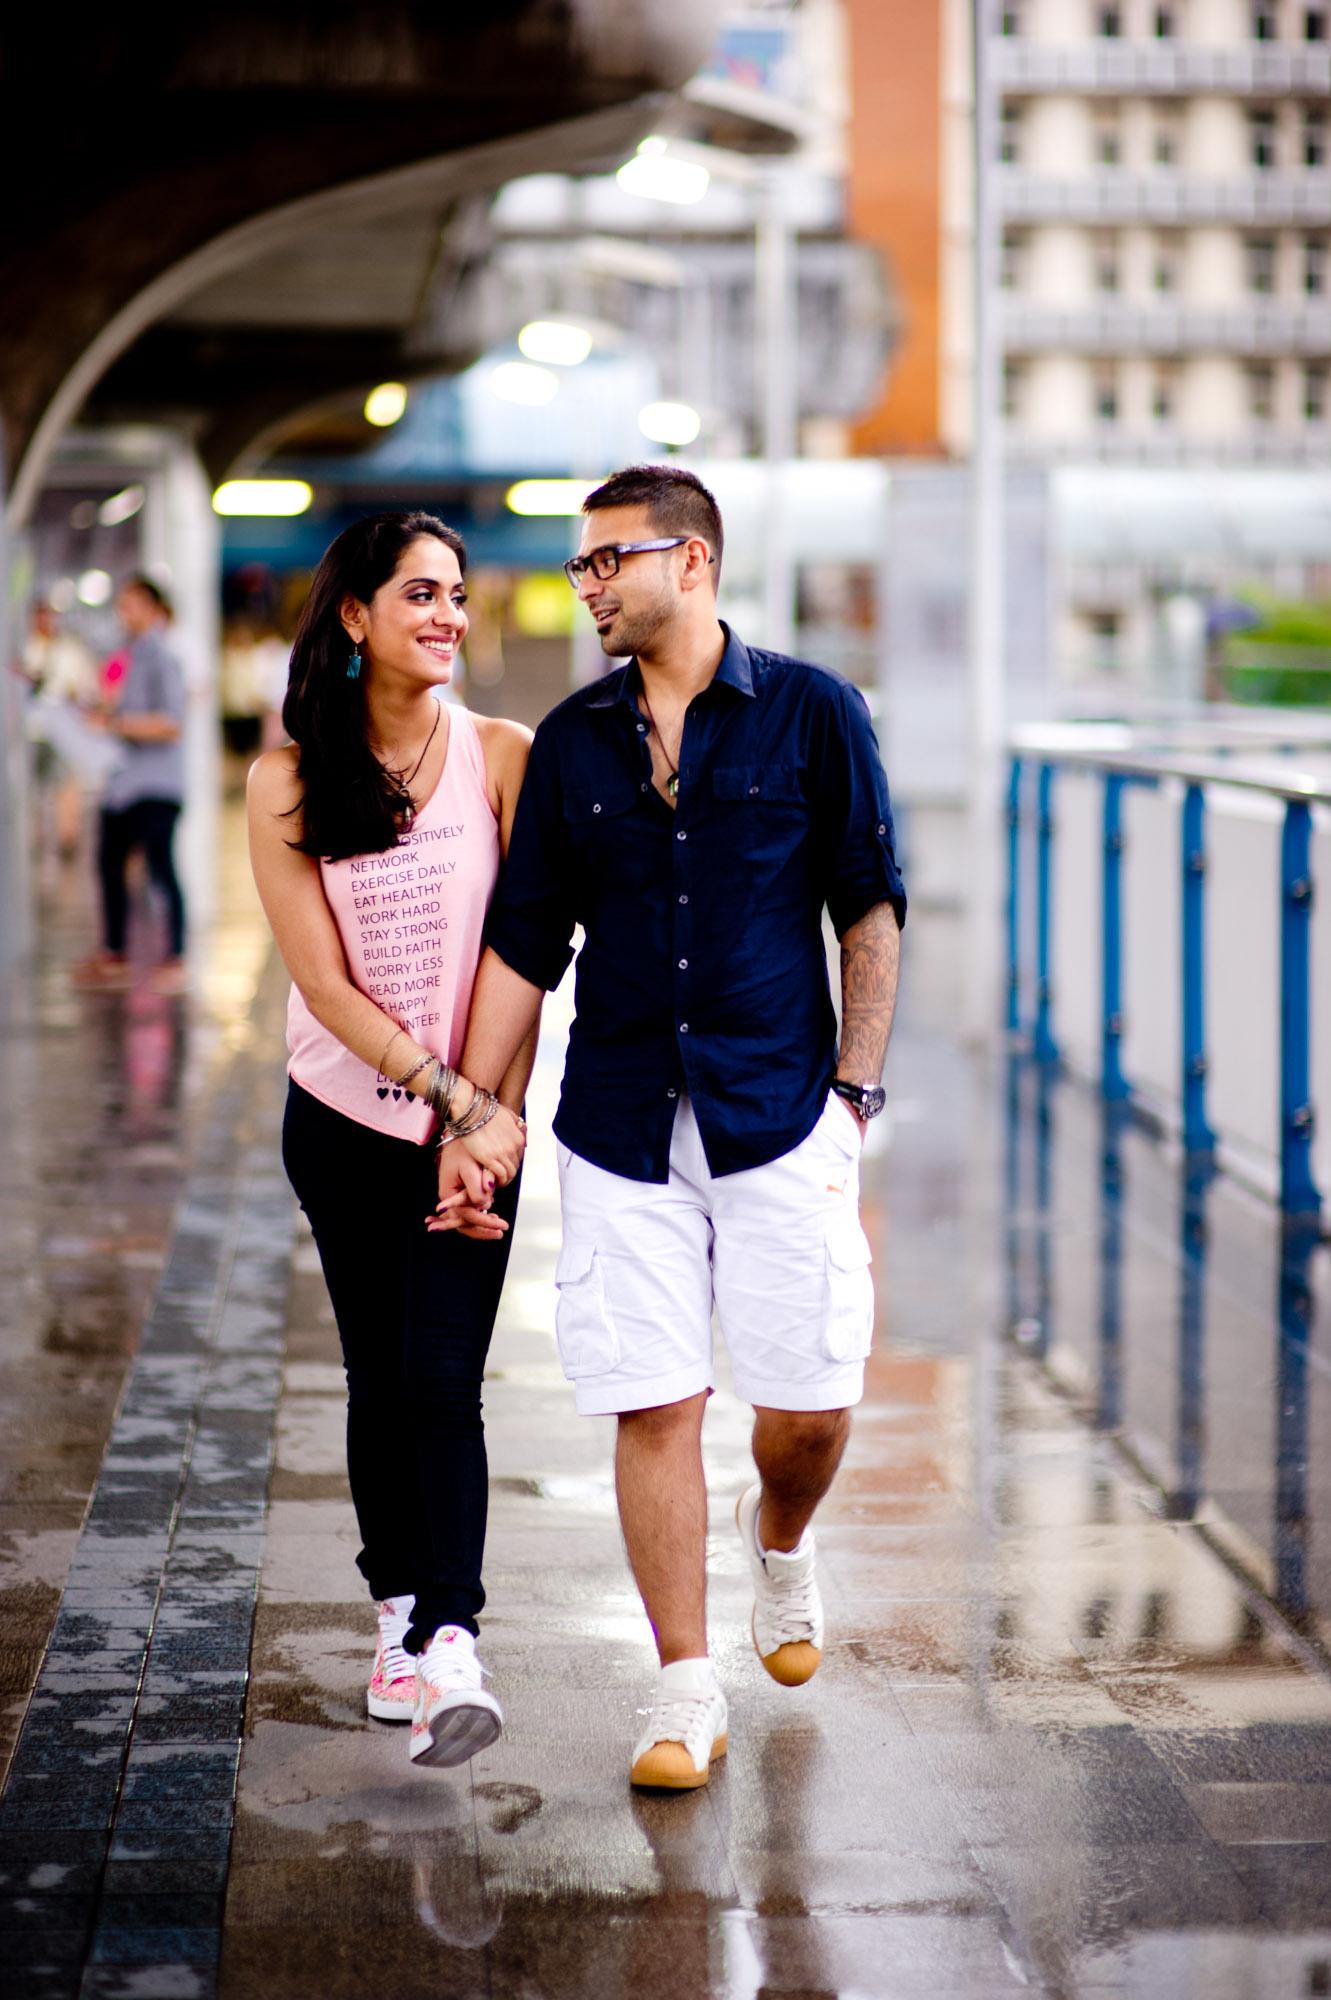 Thailand Wedding Photography: Bangkok Thailand Engagement Session: Jessie + Sav